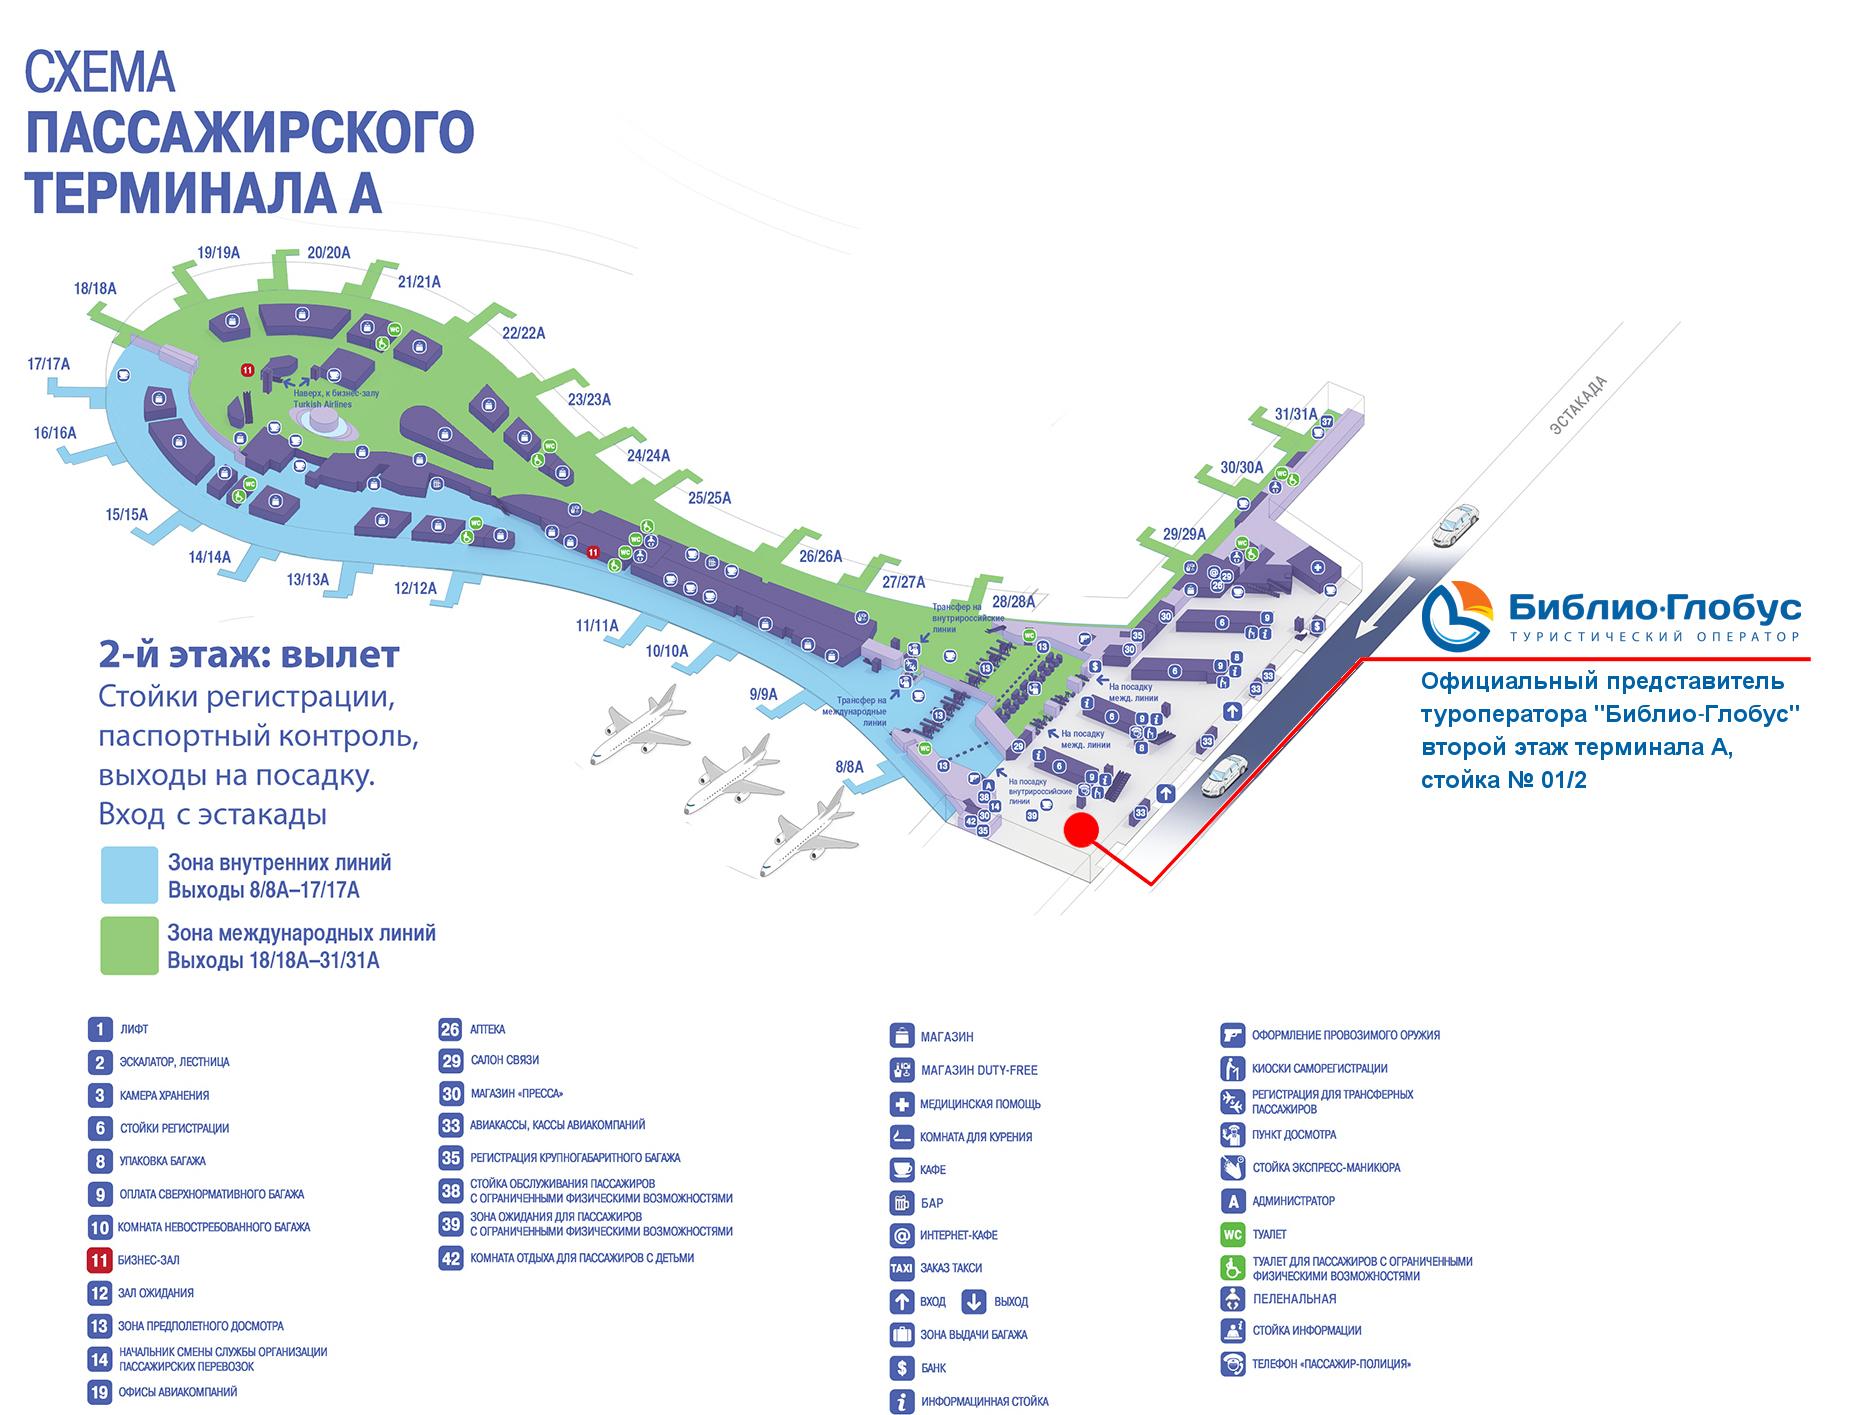 Схема аэропорта адлер библио глобус